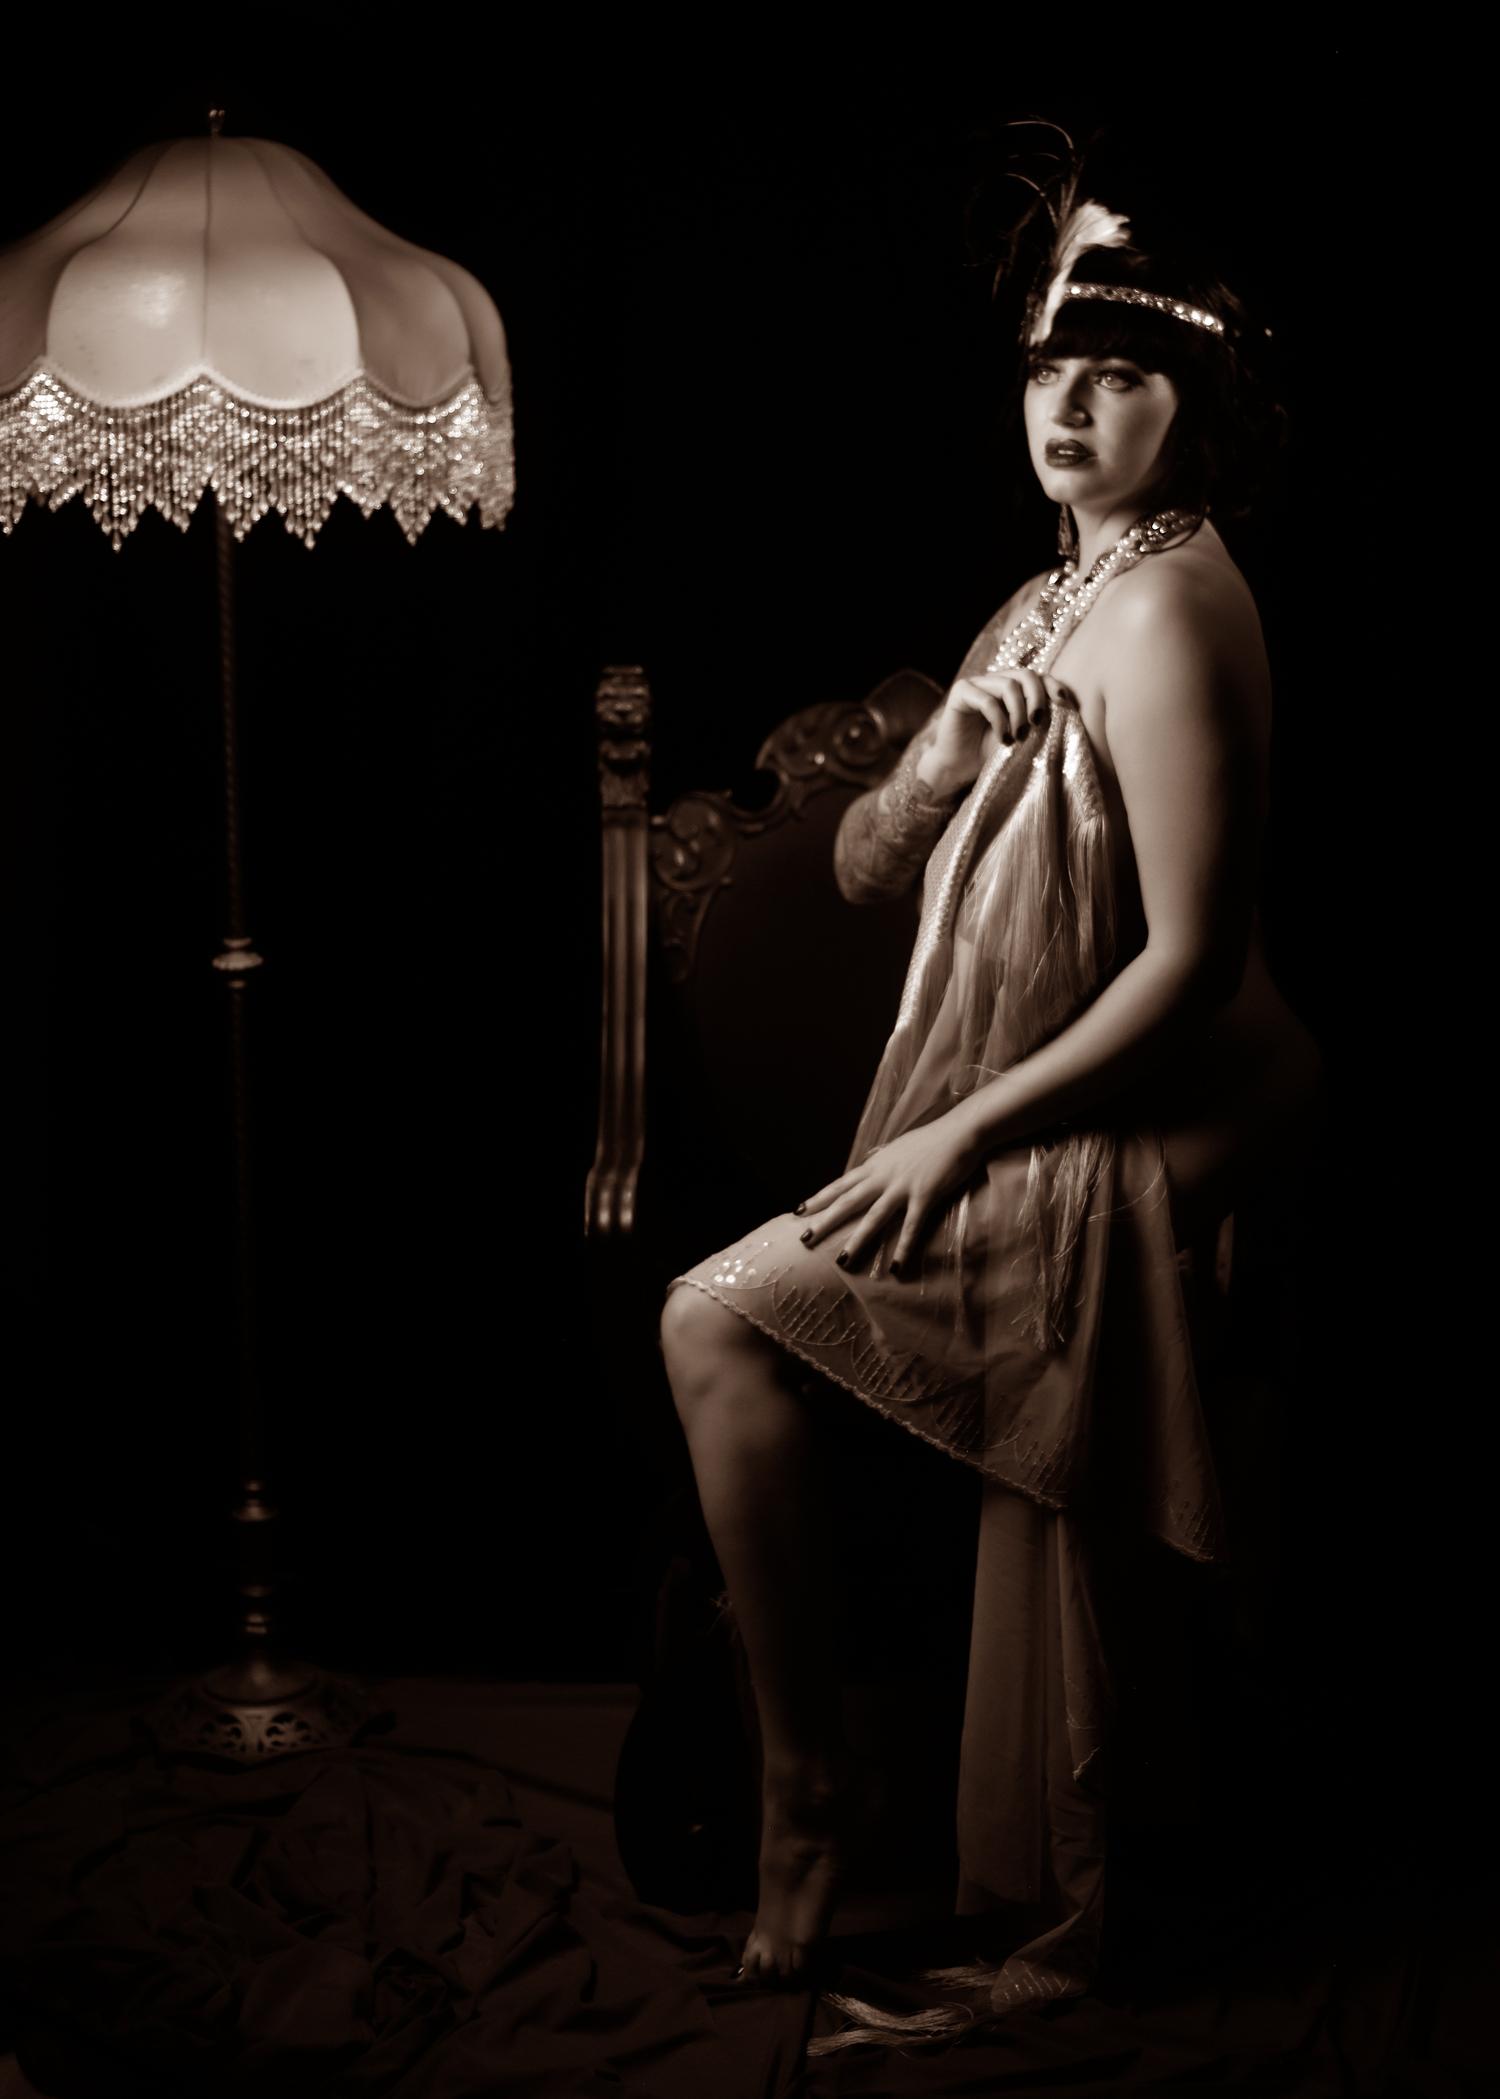 Vintage Photographer Denver 1920s Style by La Photographie 06.jpg